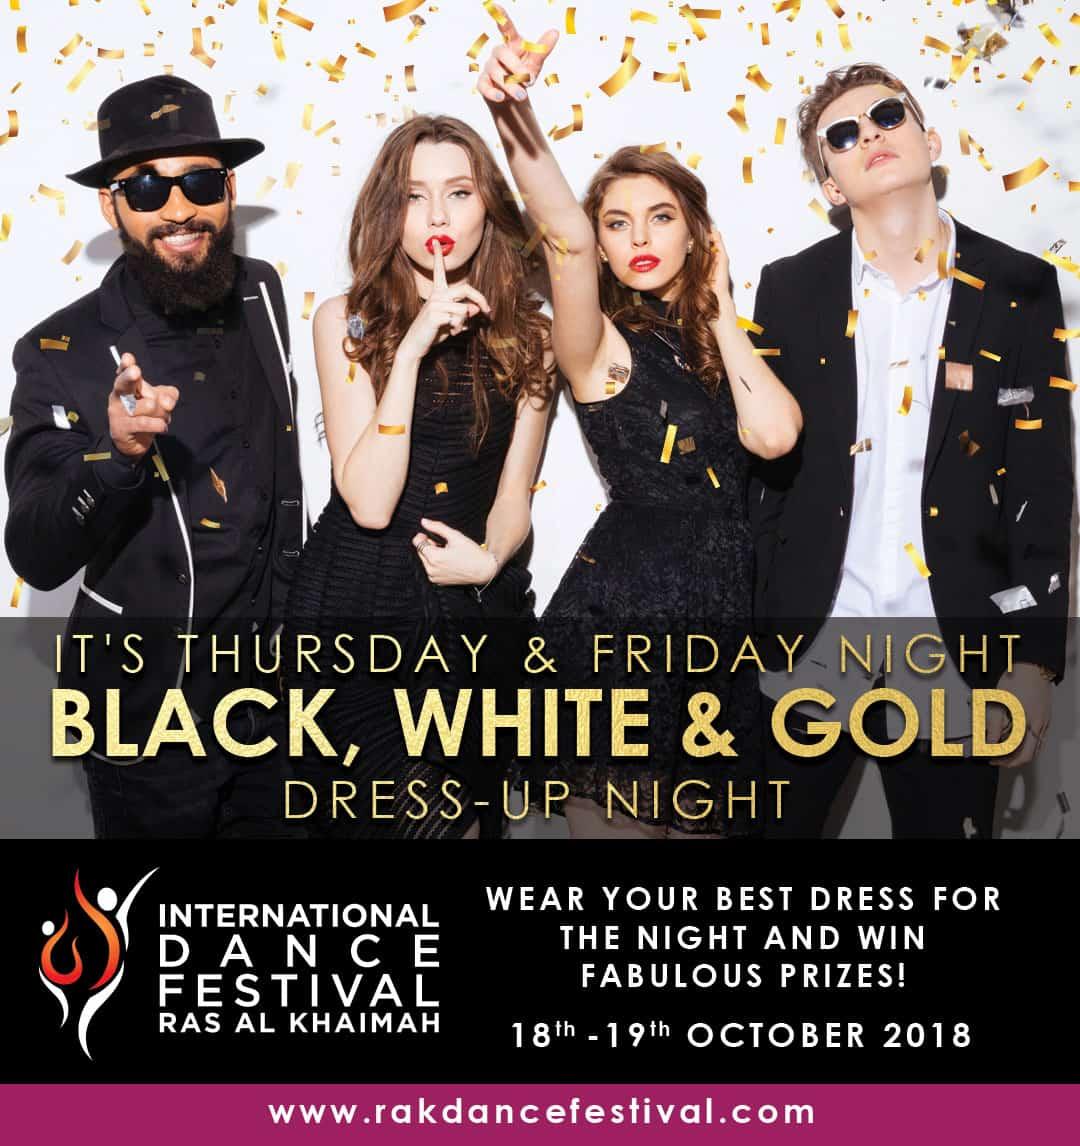 International Dance festival Ras Al Khaimah